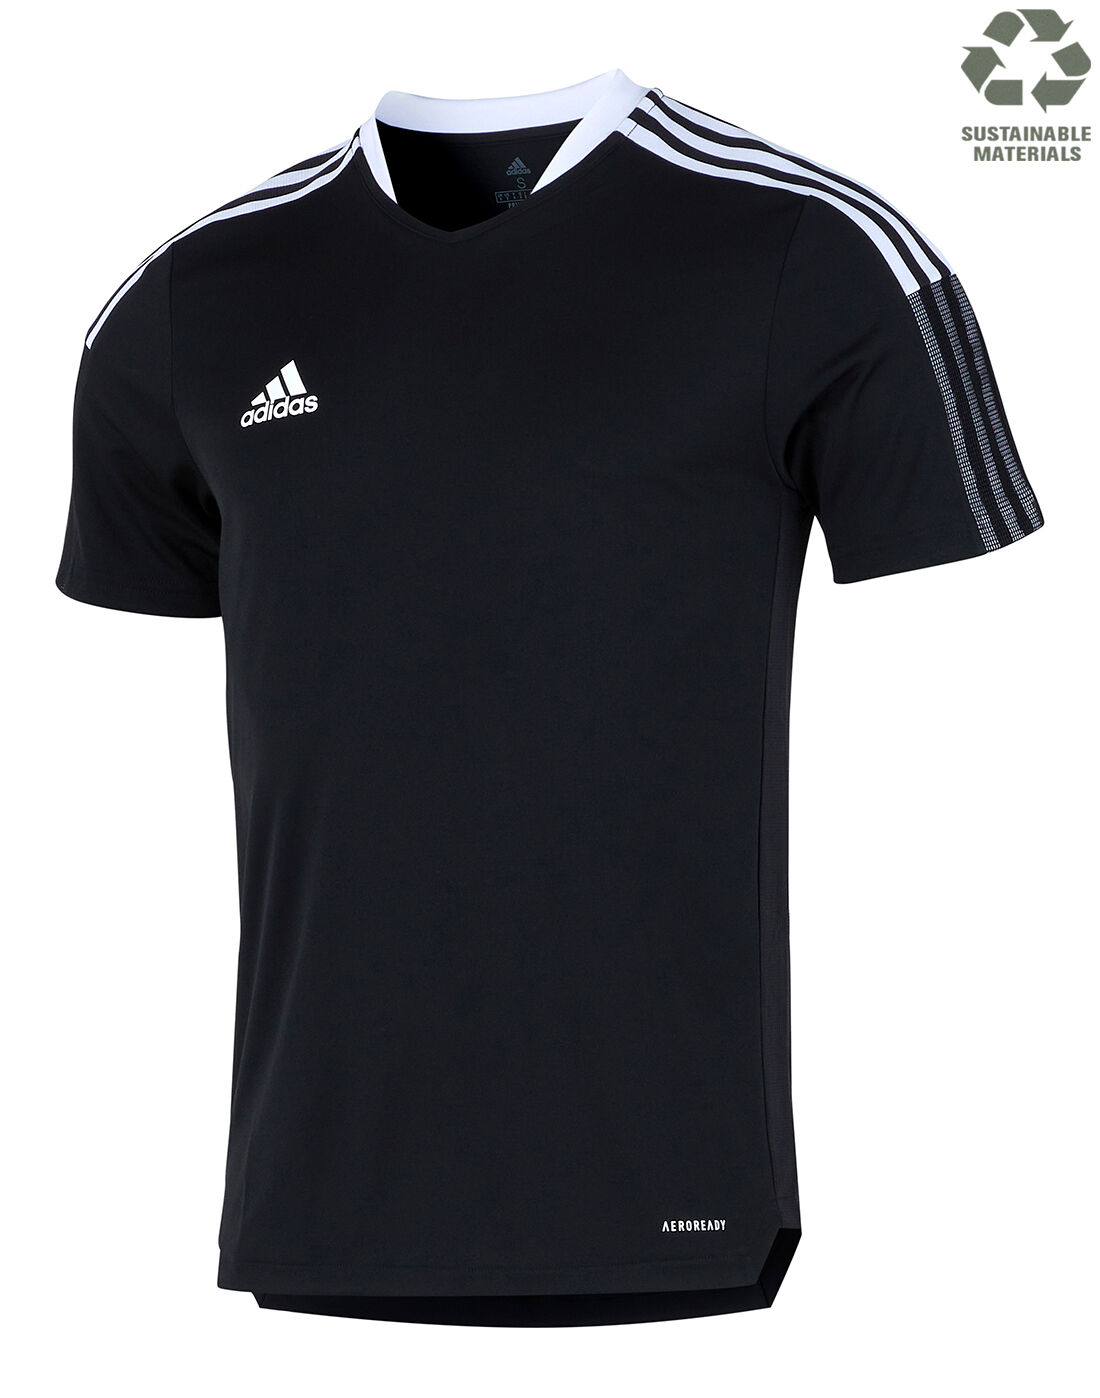 adidas Mens Tiro 21 Training T-Shirt - Black | poleras adidas ...